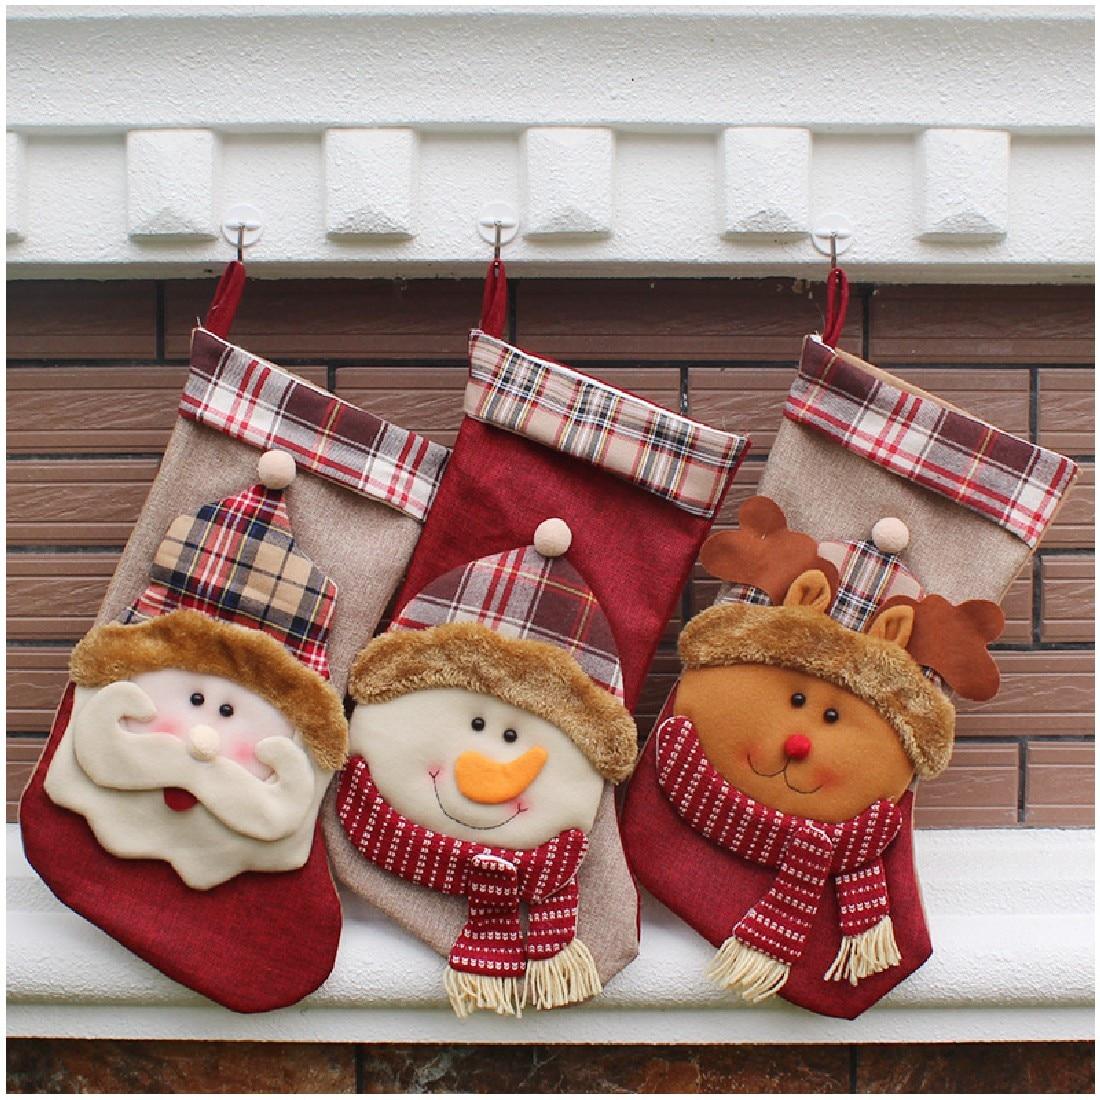 1pcs New Year 2016 Christmas Stockings Socks Santa Claus